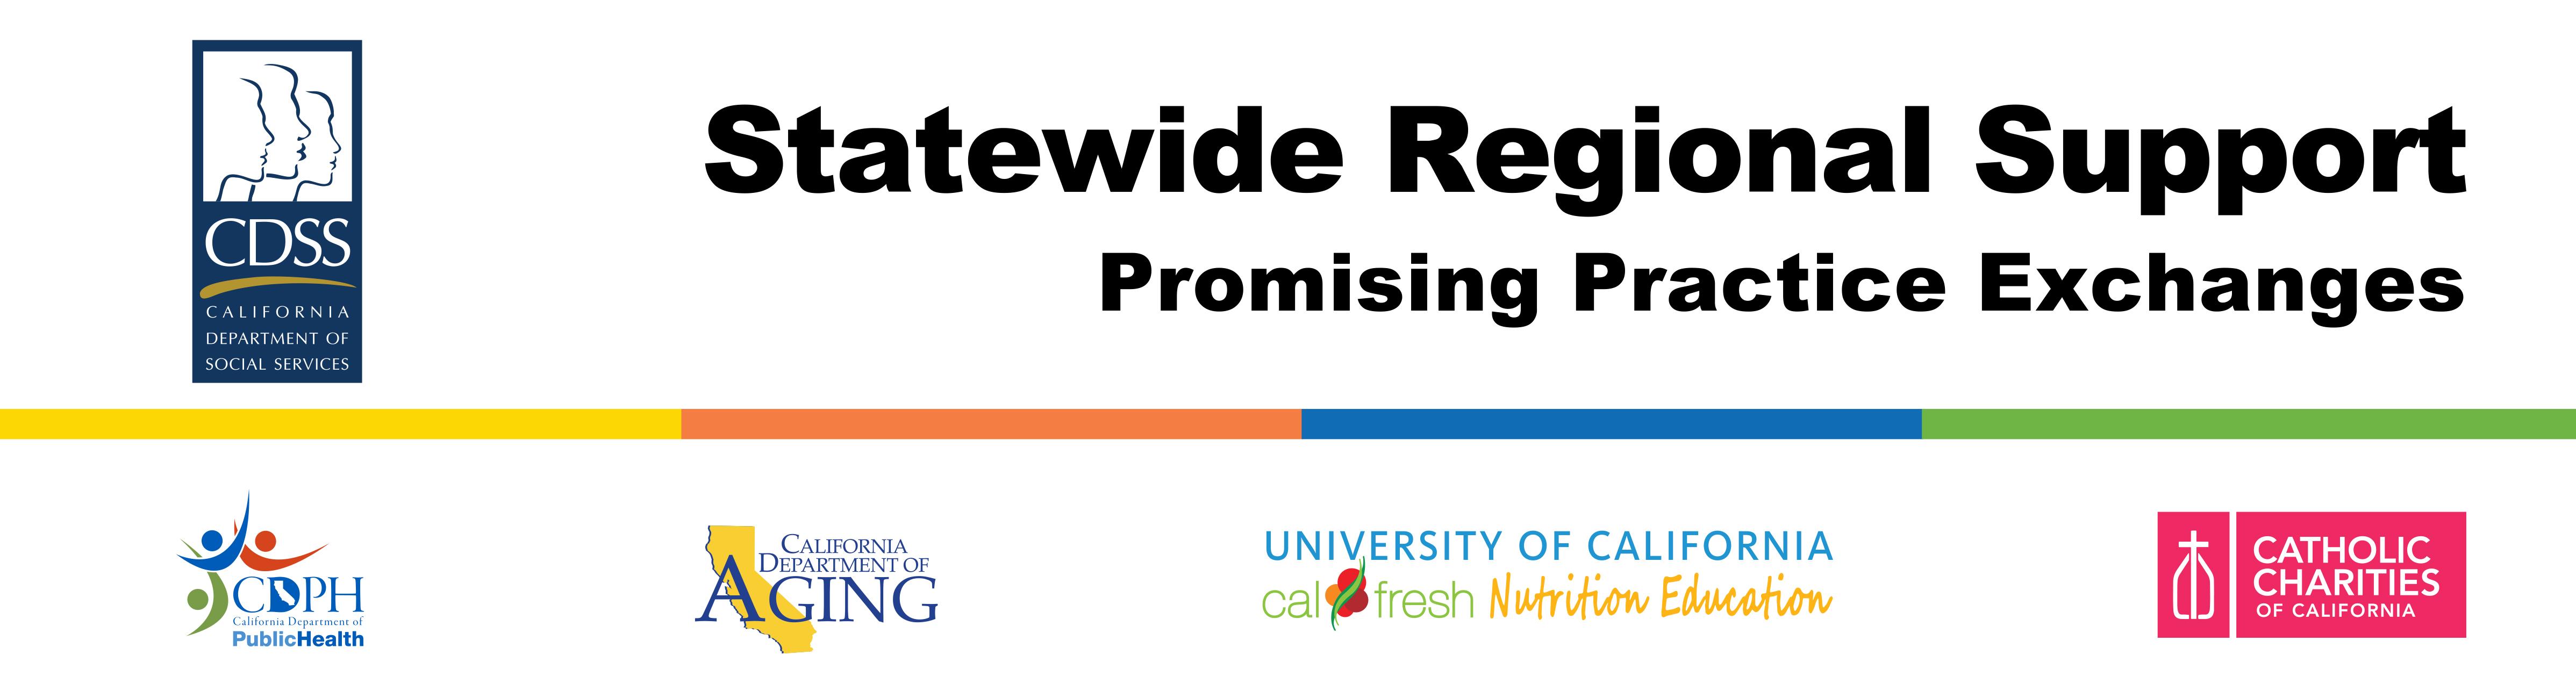 NEOPB-Statewide Regional Support-banner updated 5.